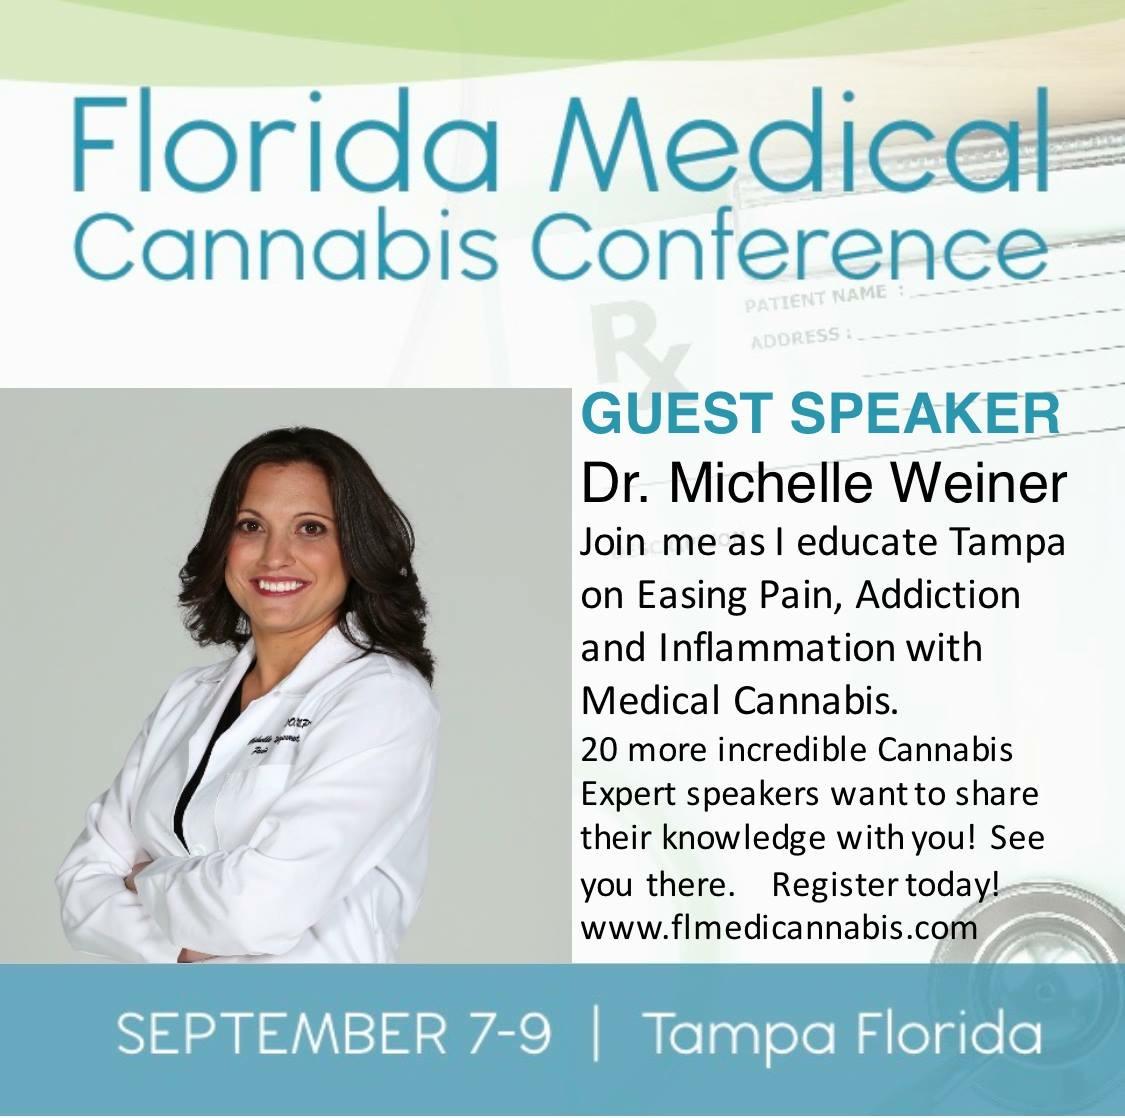 http://flmedicannabis.com/